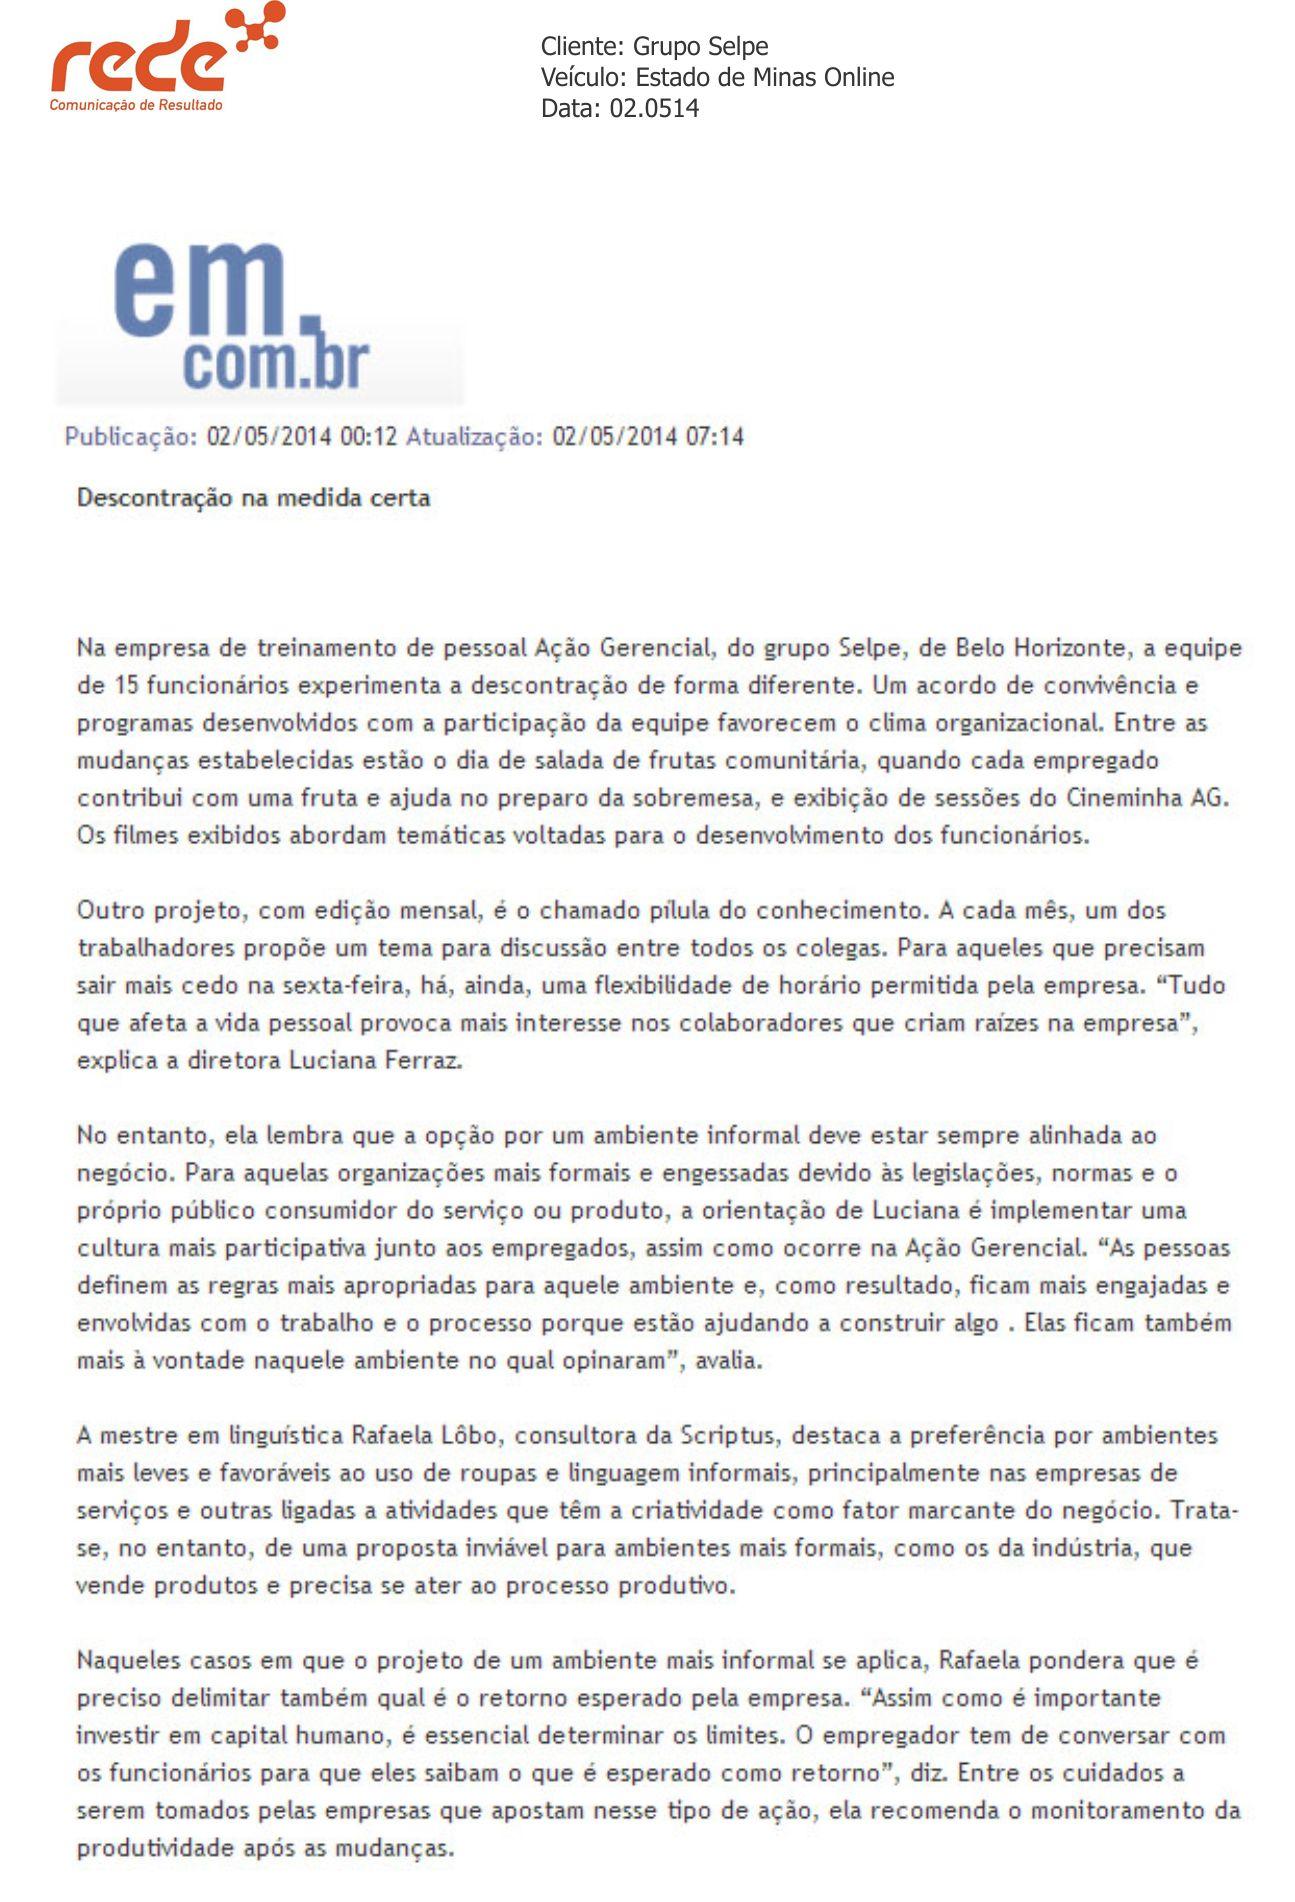 02.05.14_Estado_de_Minas_Online